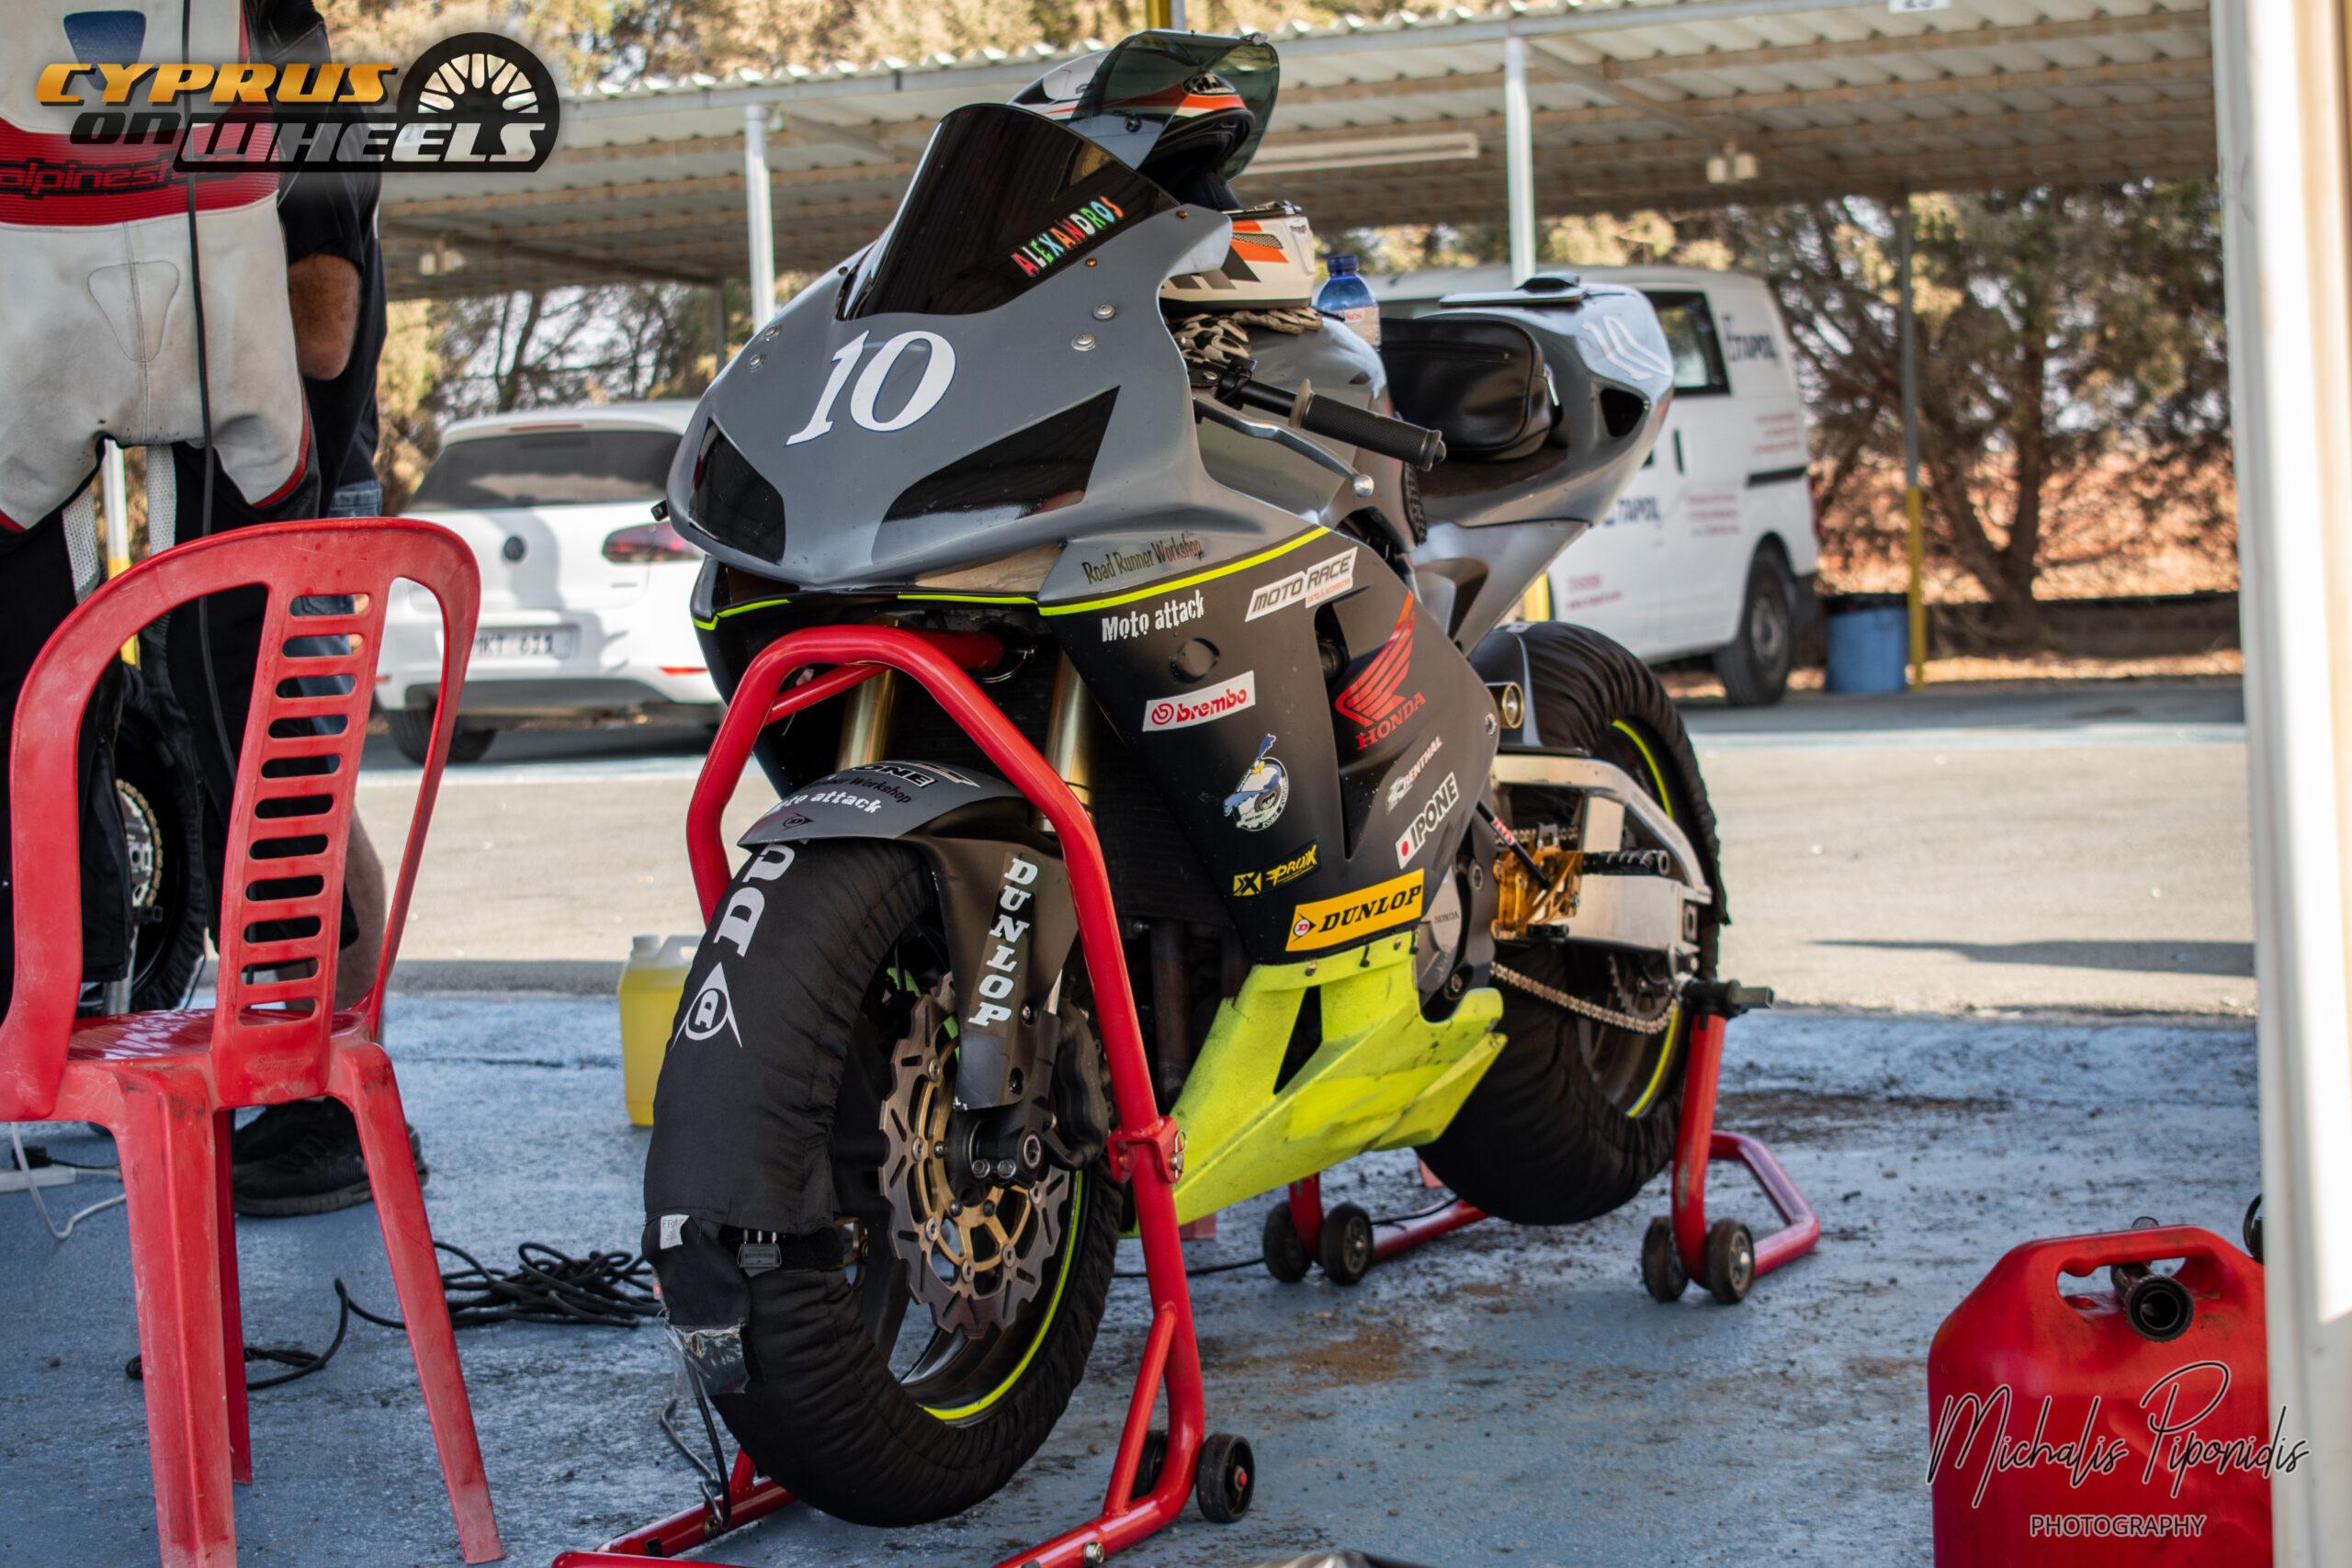 Honda Cbr racing fairing